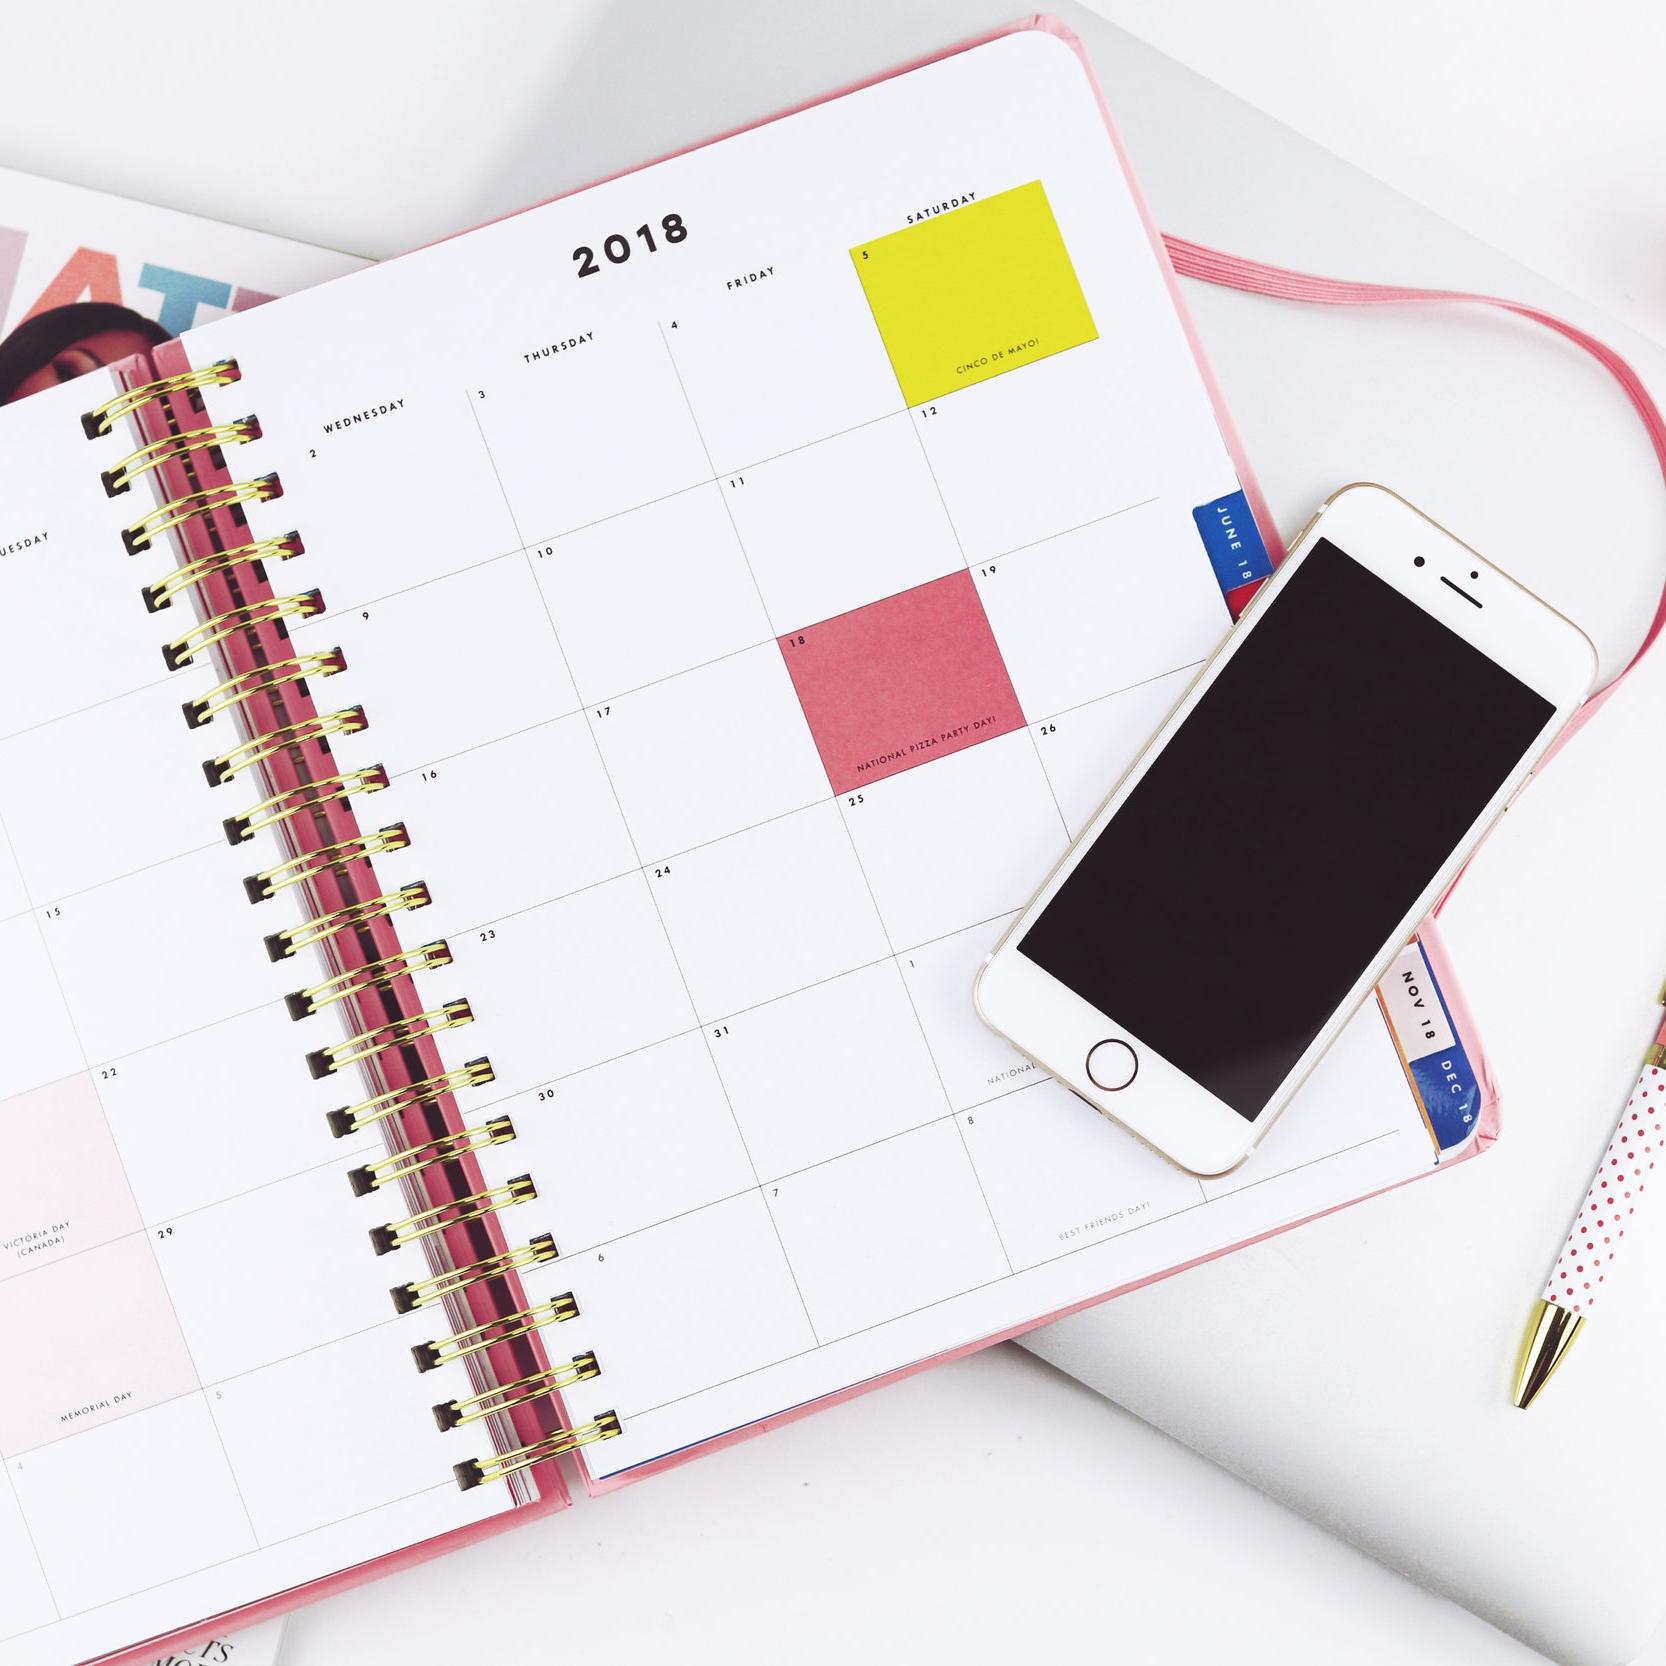 Exam Timetable Xmas 2018 -